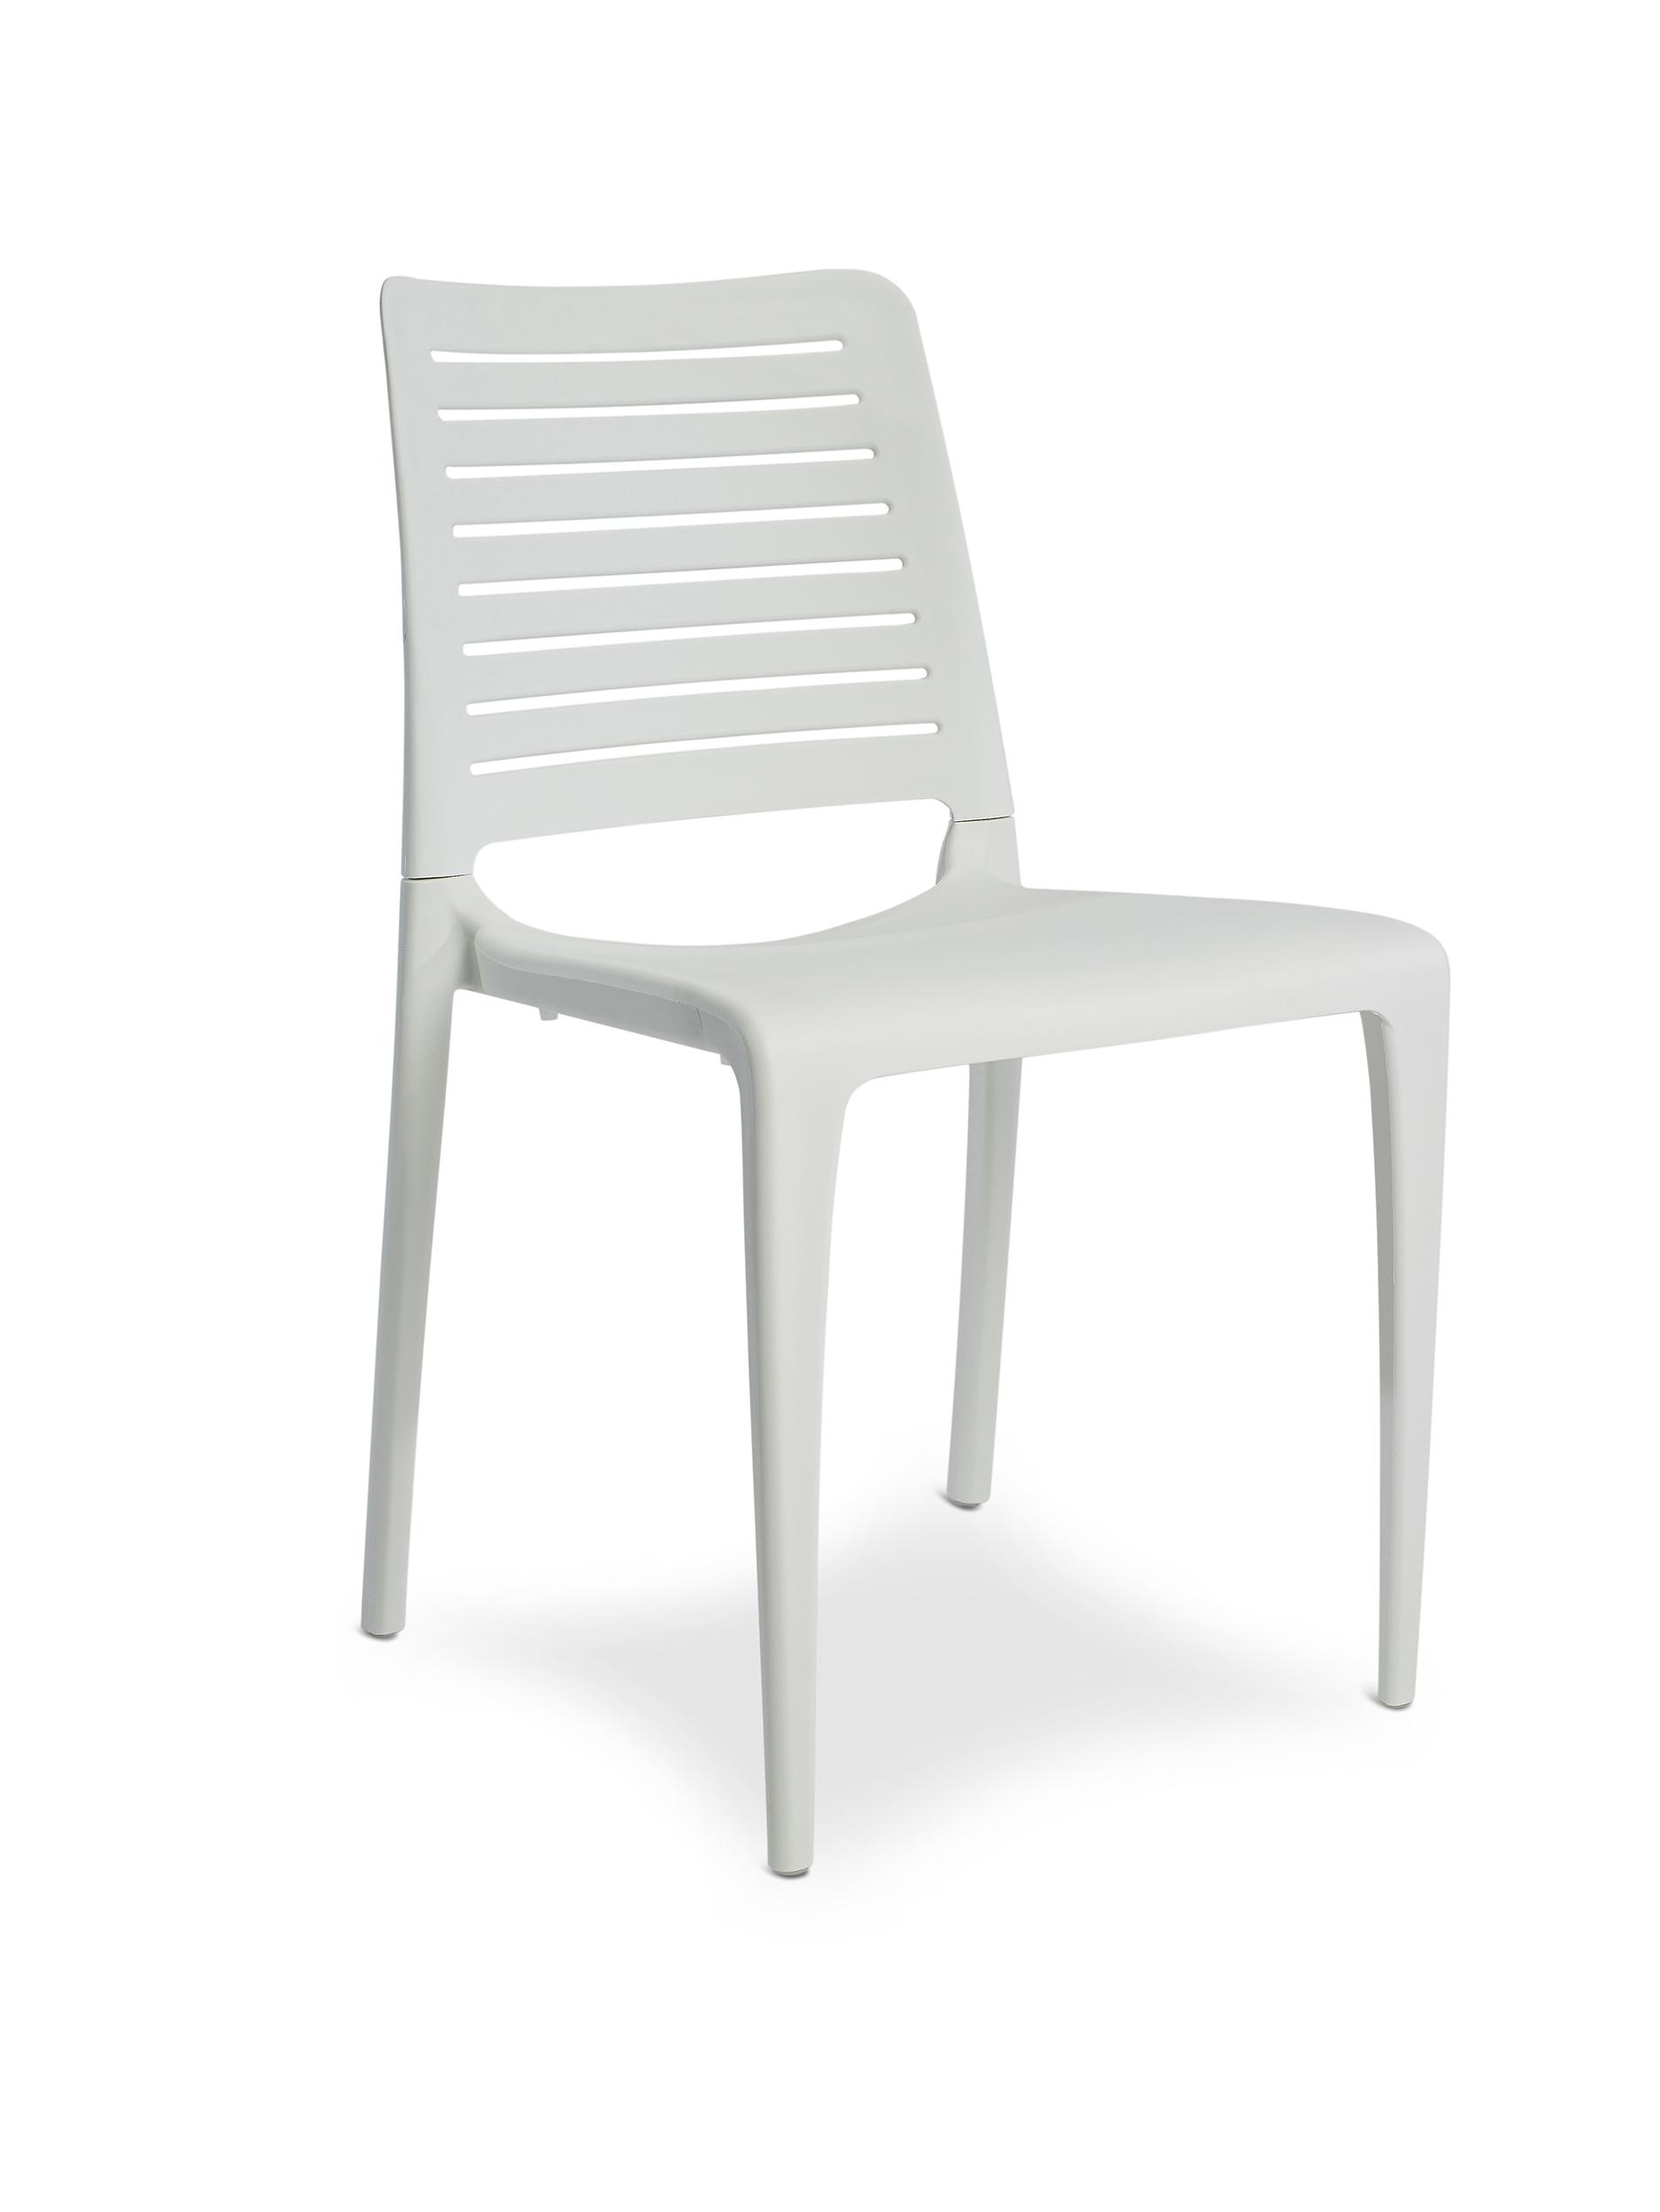 Chaise de jardin en polypropylène renforcé blanc